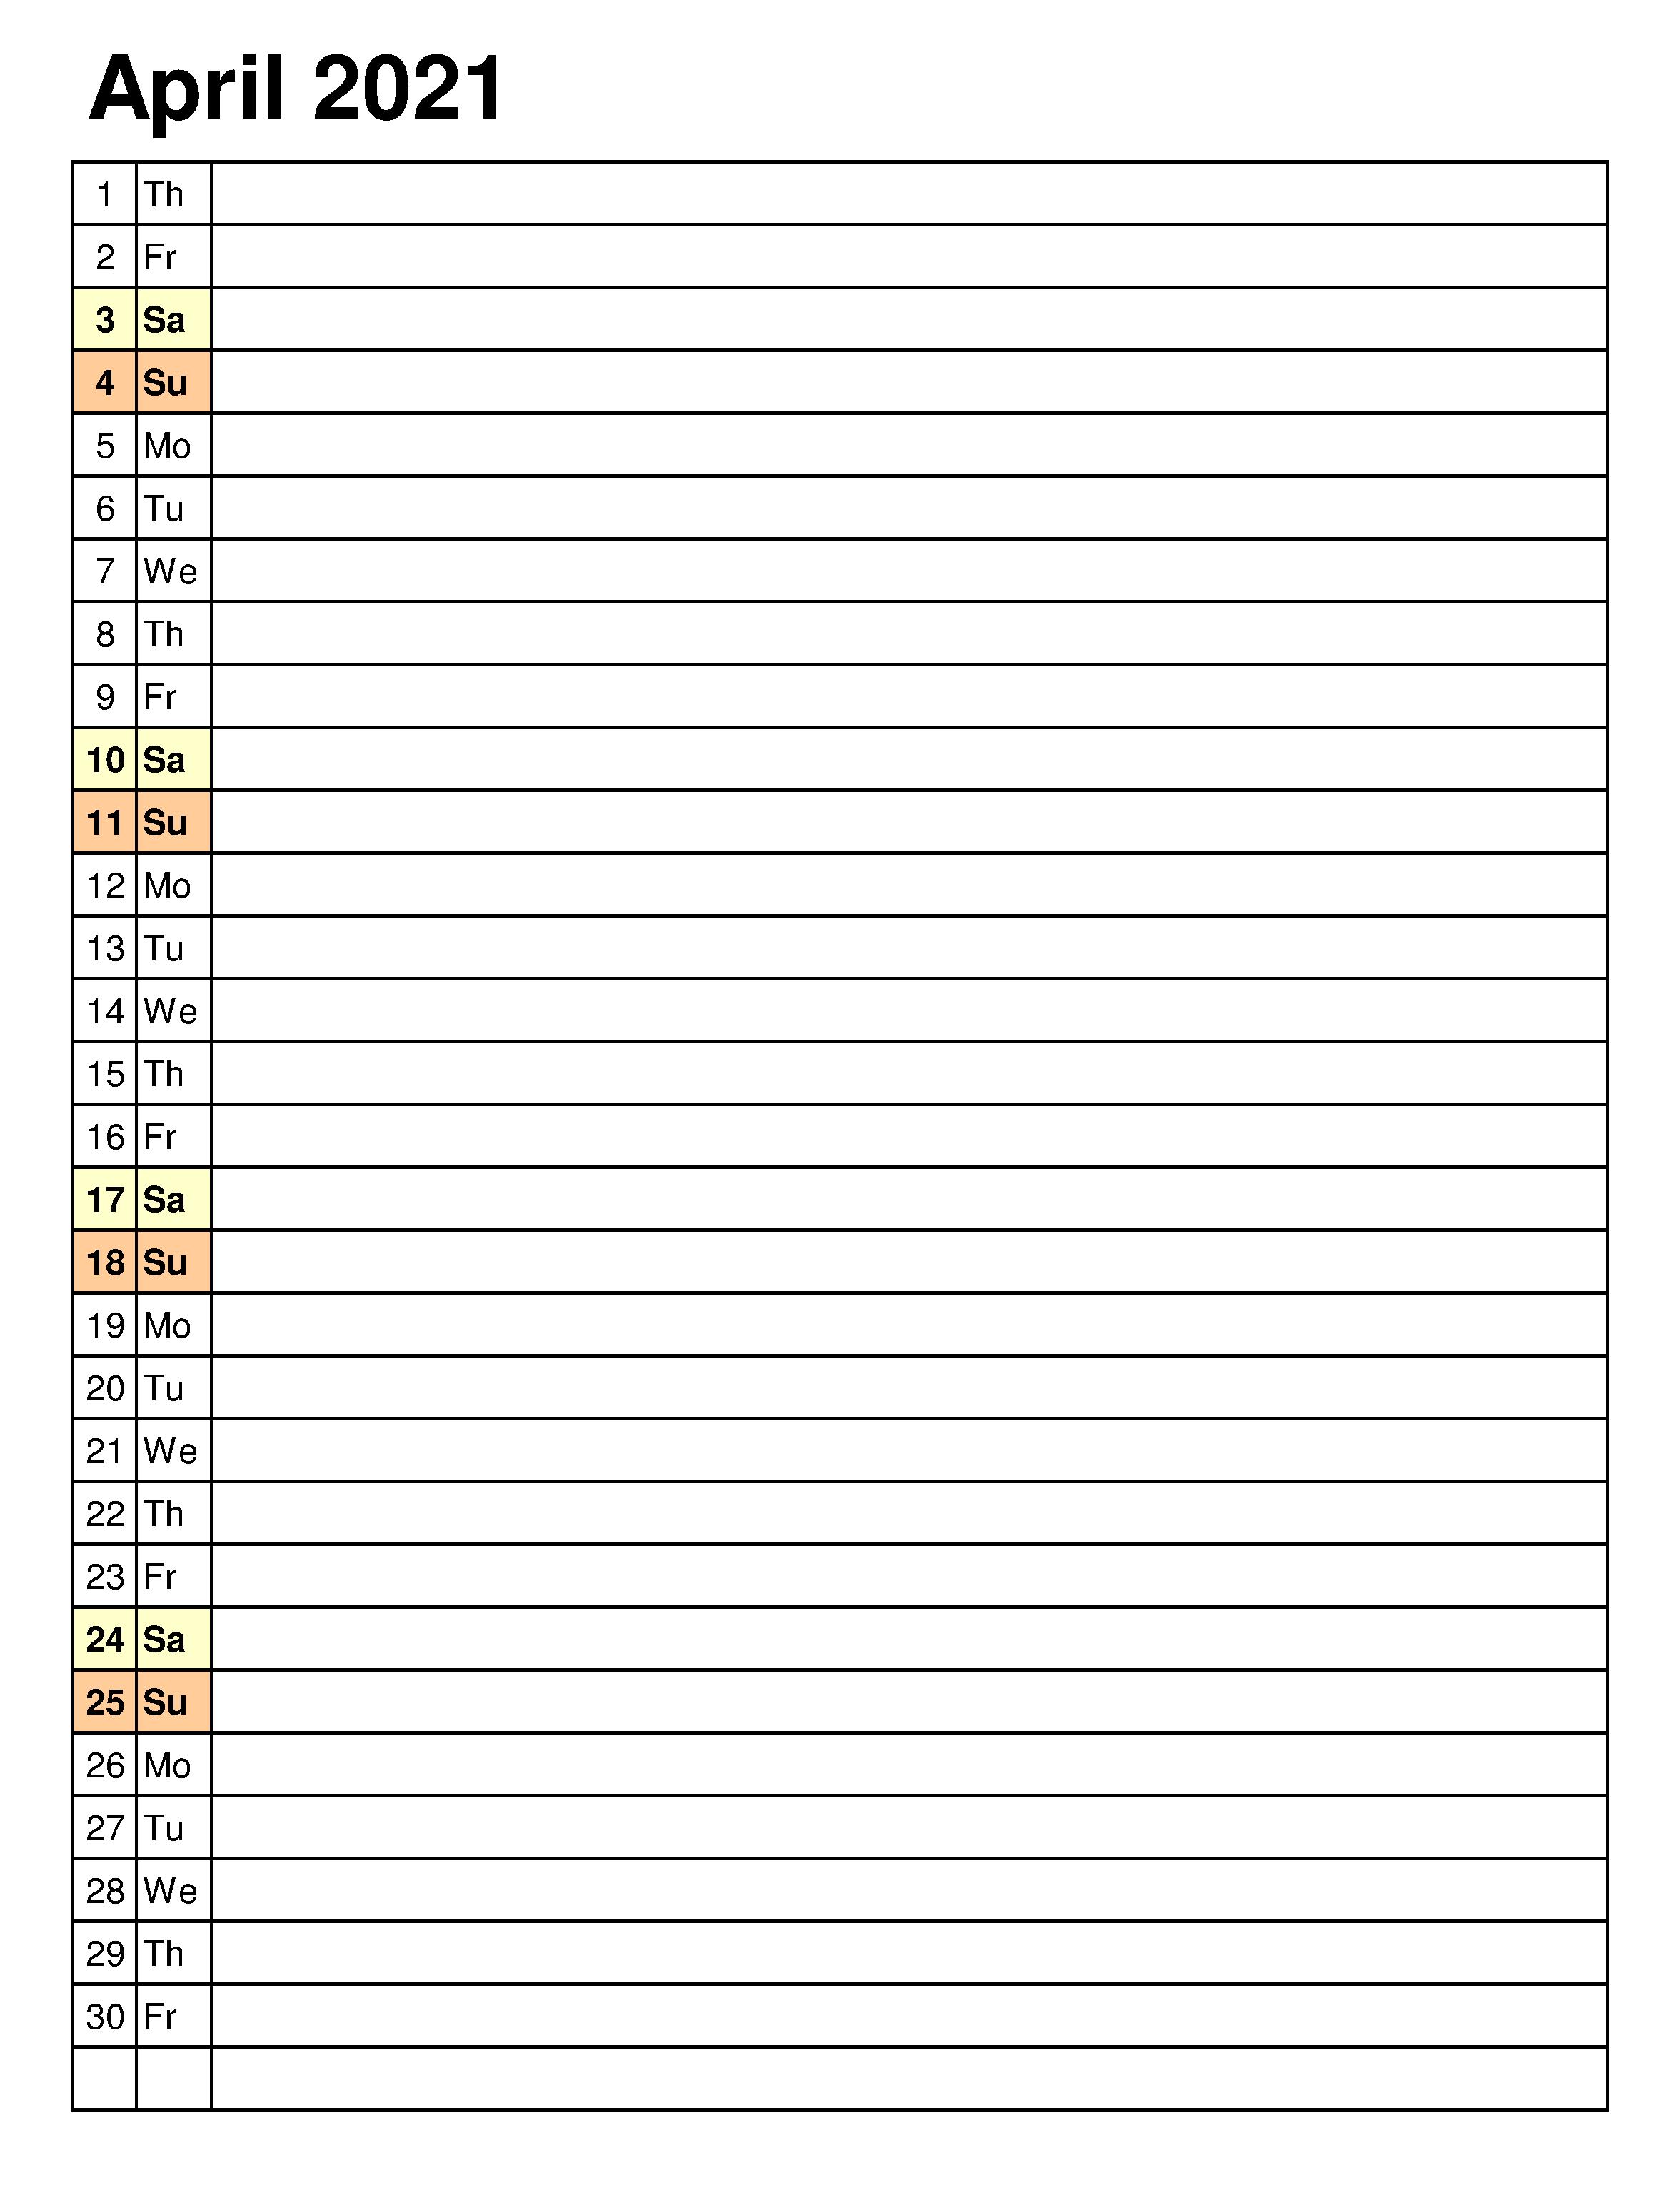 April 2021 Vertical Calendar in Word